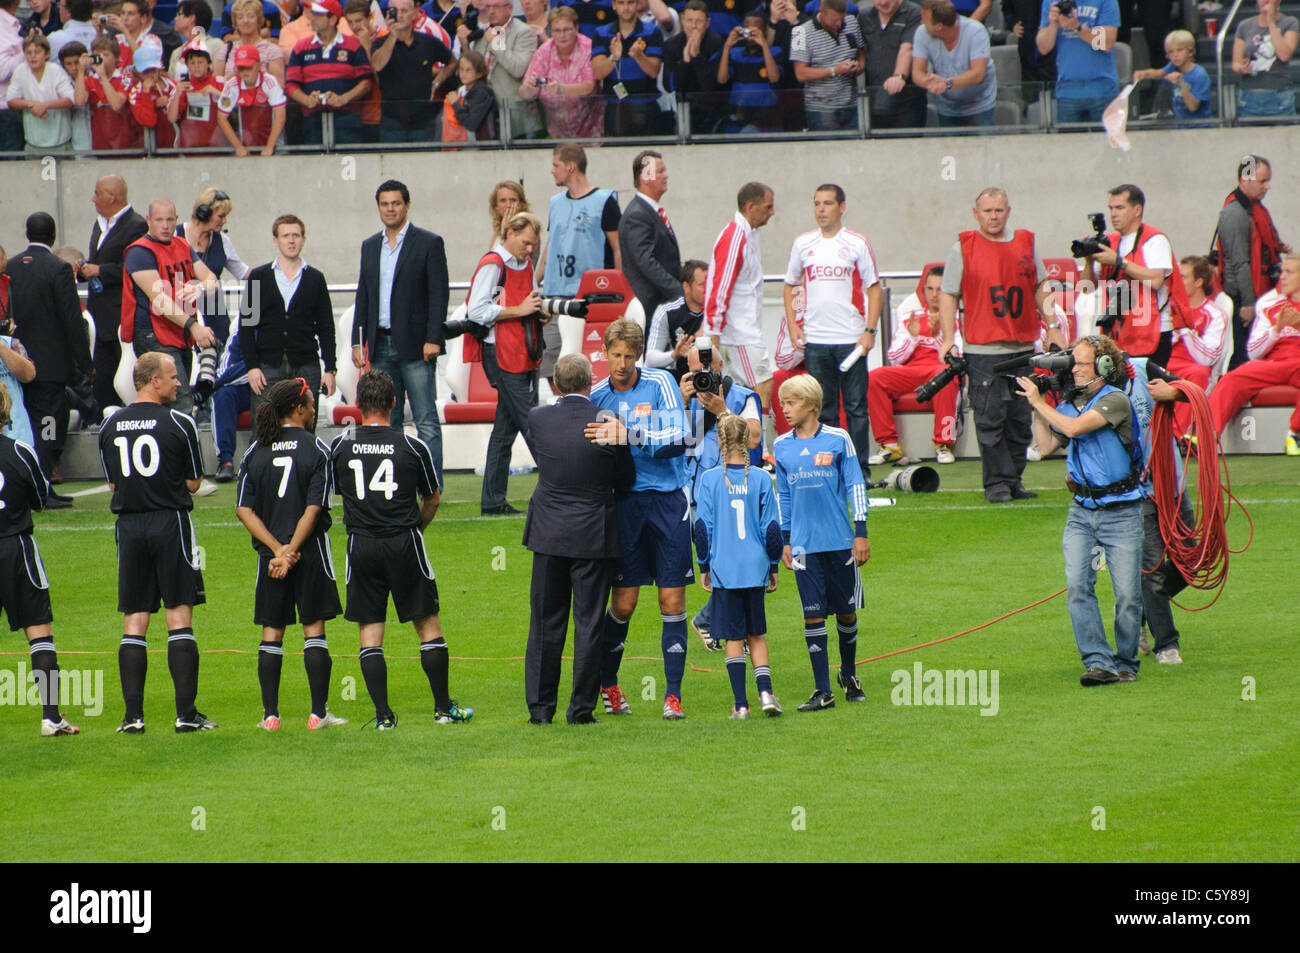 Edwin van der Sar greeting Sir Alex Ferguson before his farewell game. - Stock Image